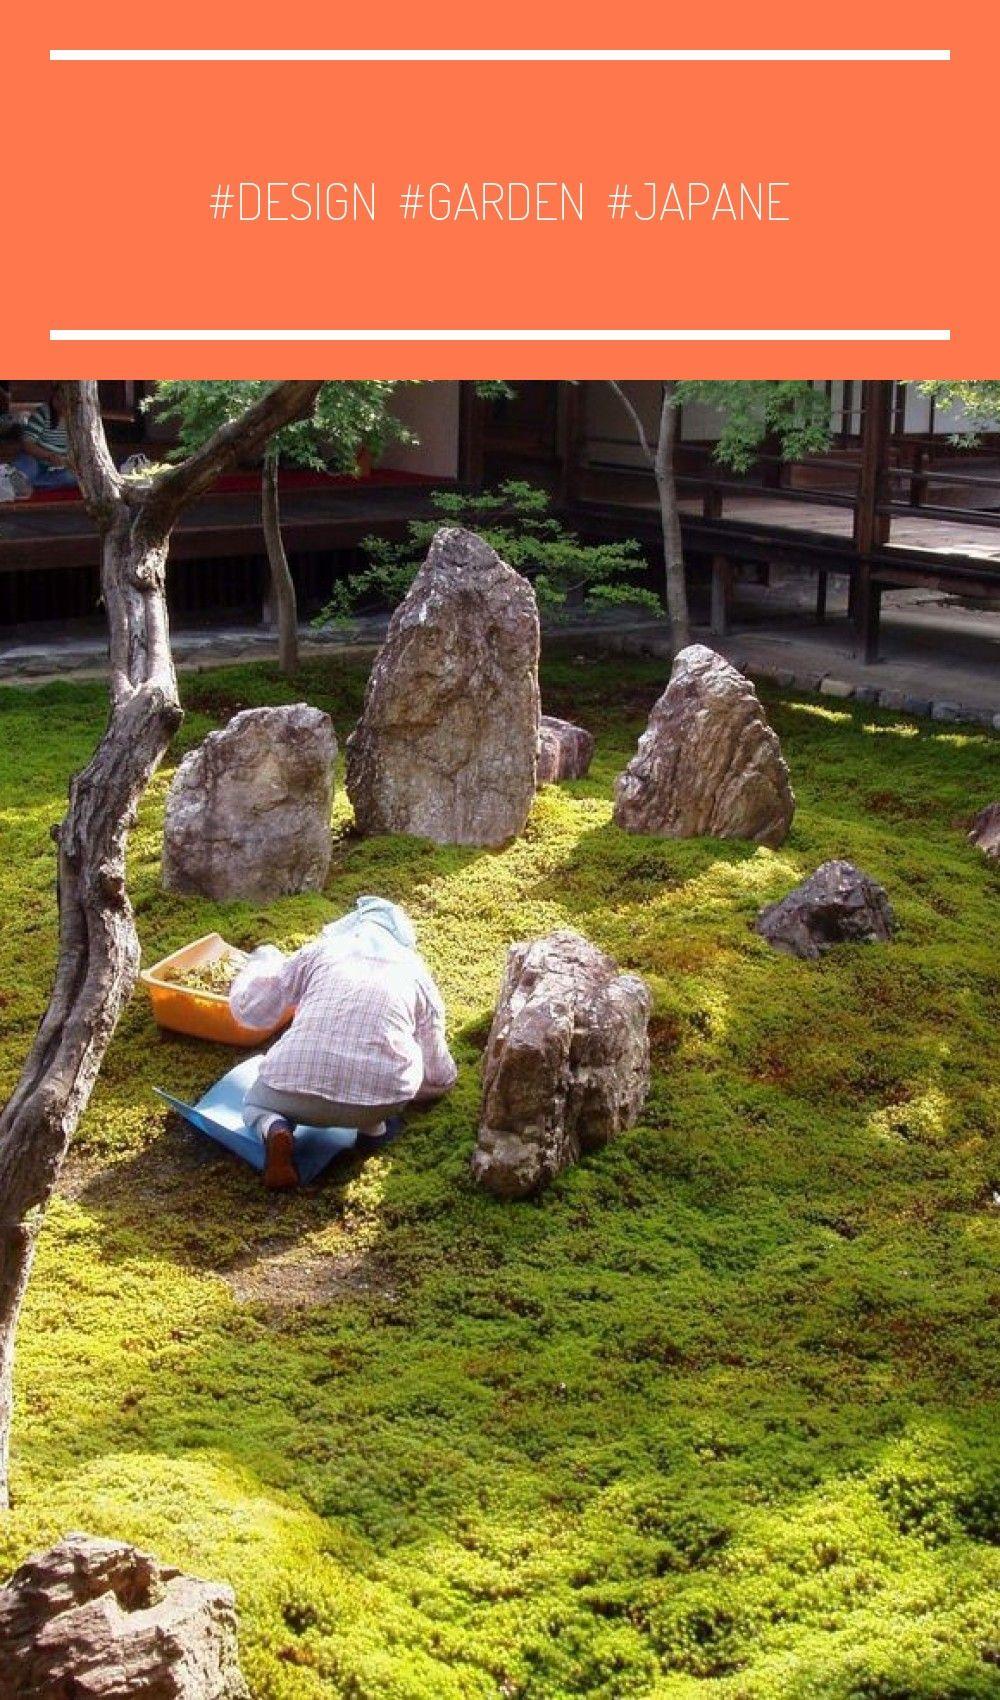 #Design  #garden  #japanese  #JapaneseGardendesign  #JapaneseGarde...  #smalljapanesegarden Small Japanese garden design,   #Design  #garden  #japanese  #JapaneseGardendesign  #JapaneseGardenfountain  #JapaneseGardenkyoto  #Small  #smalljapanesegarden Small Japanese garden design,   #Design  #garden  #japanese  #JapaneseGardendesign  #JapaneseGarde...  #smalljapanesegarden Small Japanese garden design,   #Design  #garden  #japanese  #JapaneseGardendesign  #JapaneseGardenfountain  #Japanese #Smal #smalljapanesegarden